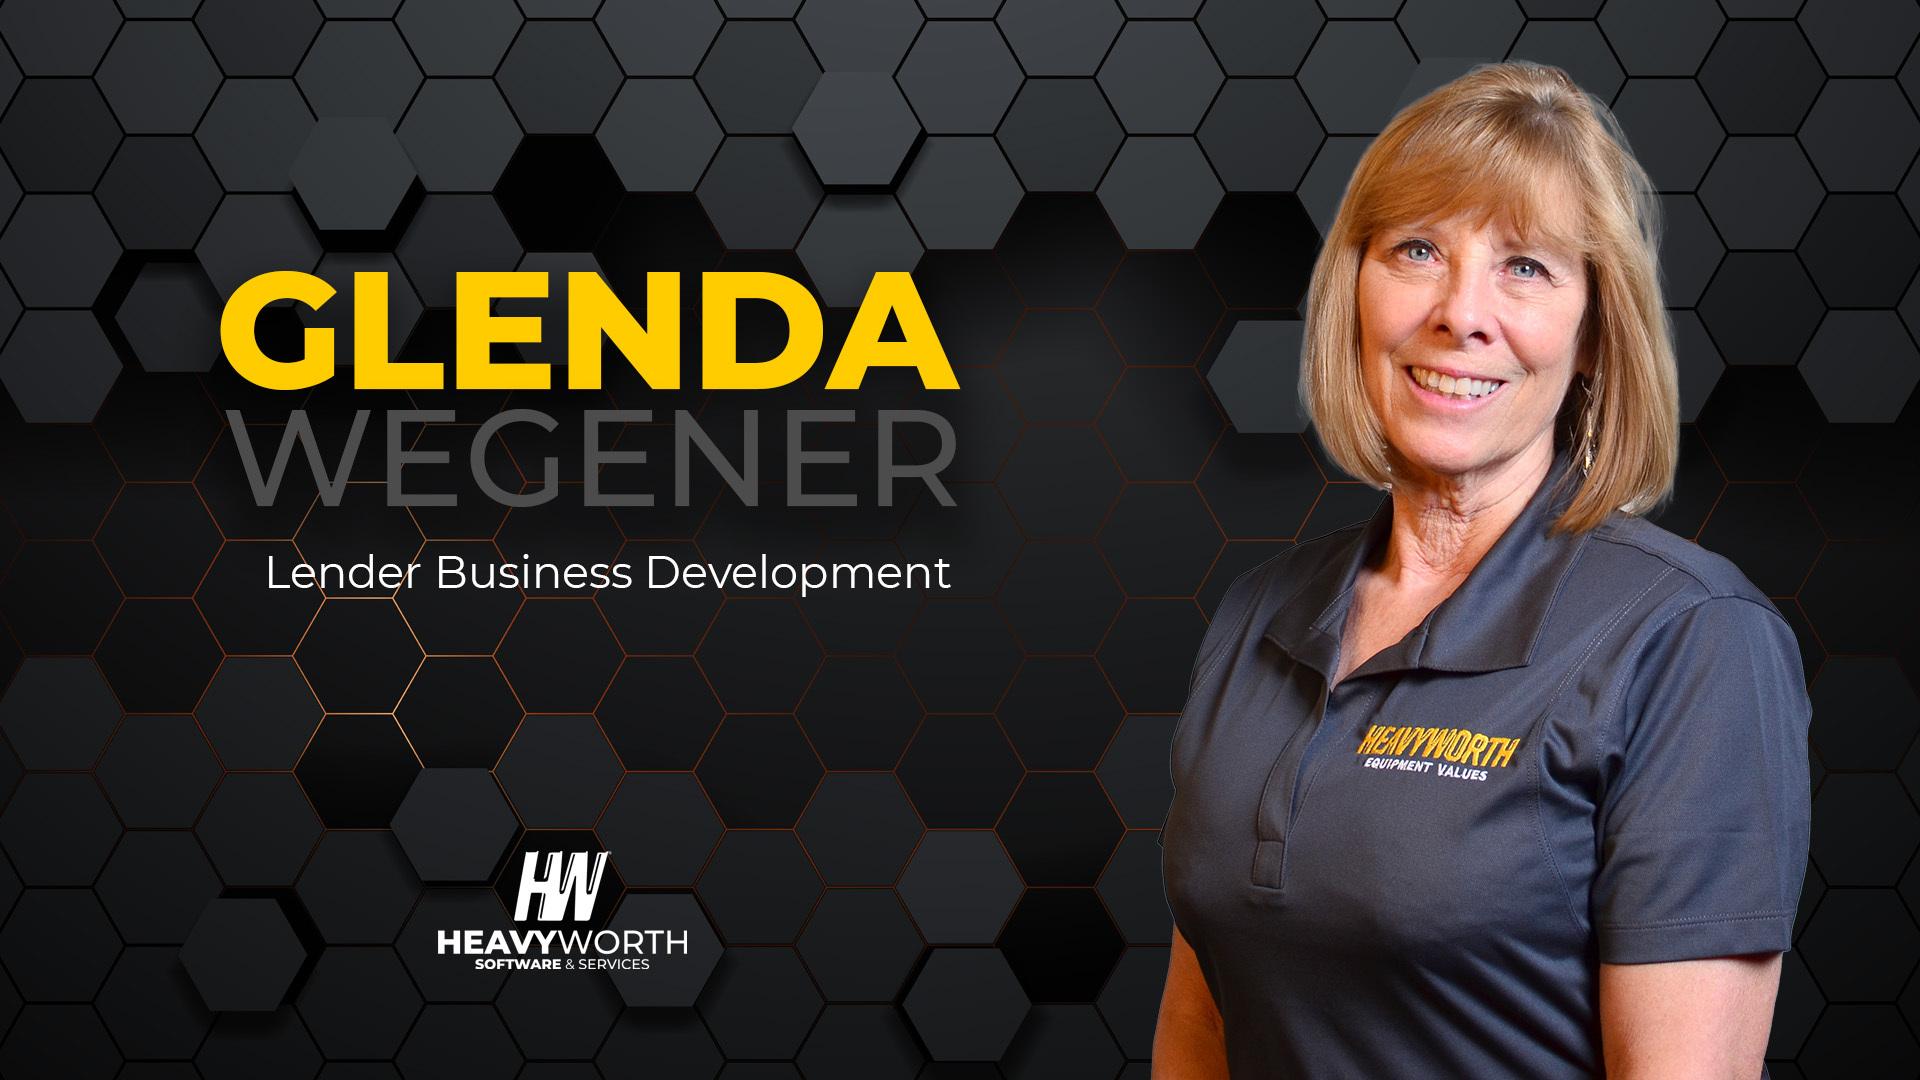 Glenda Wegener